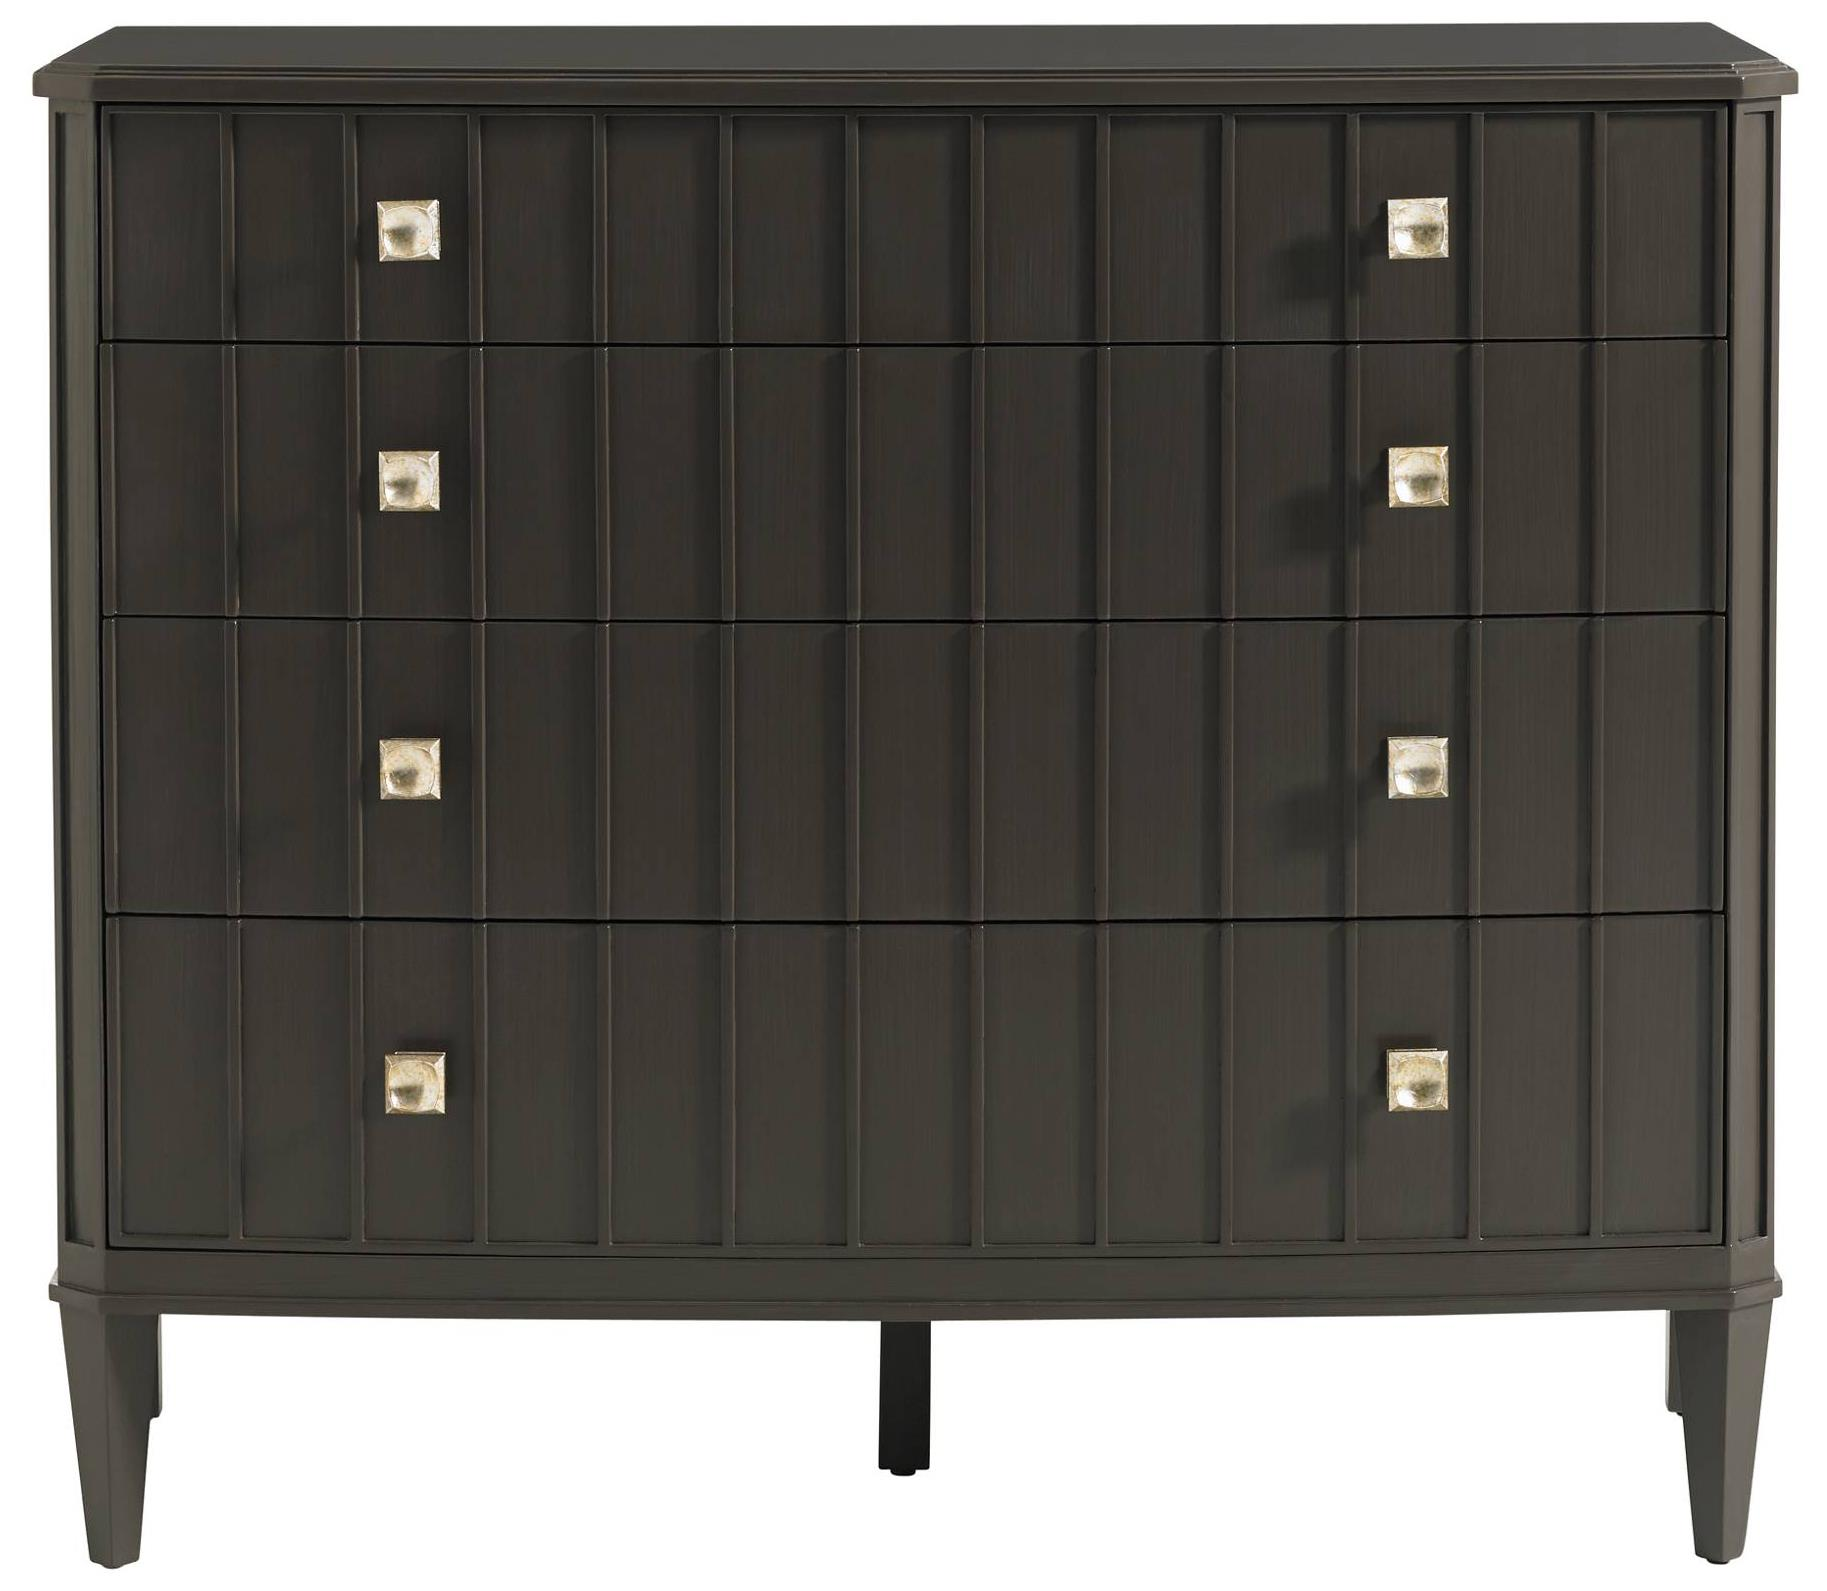 Stanley Furniture Crestaire Monterey Single Dresser - Item Number: 436-83-04